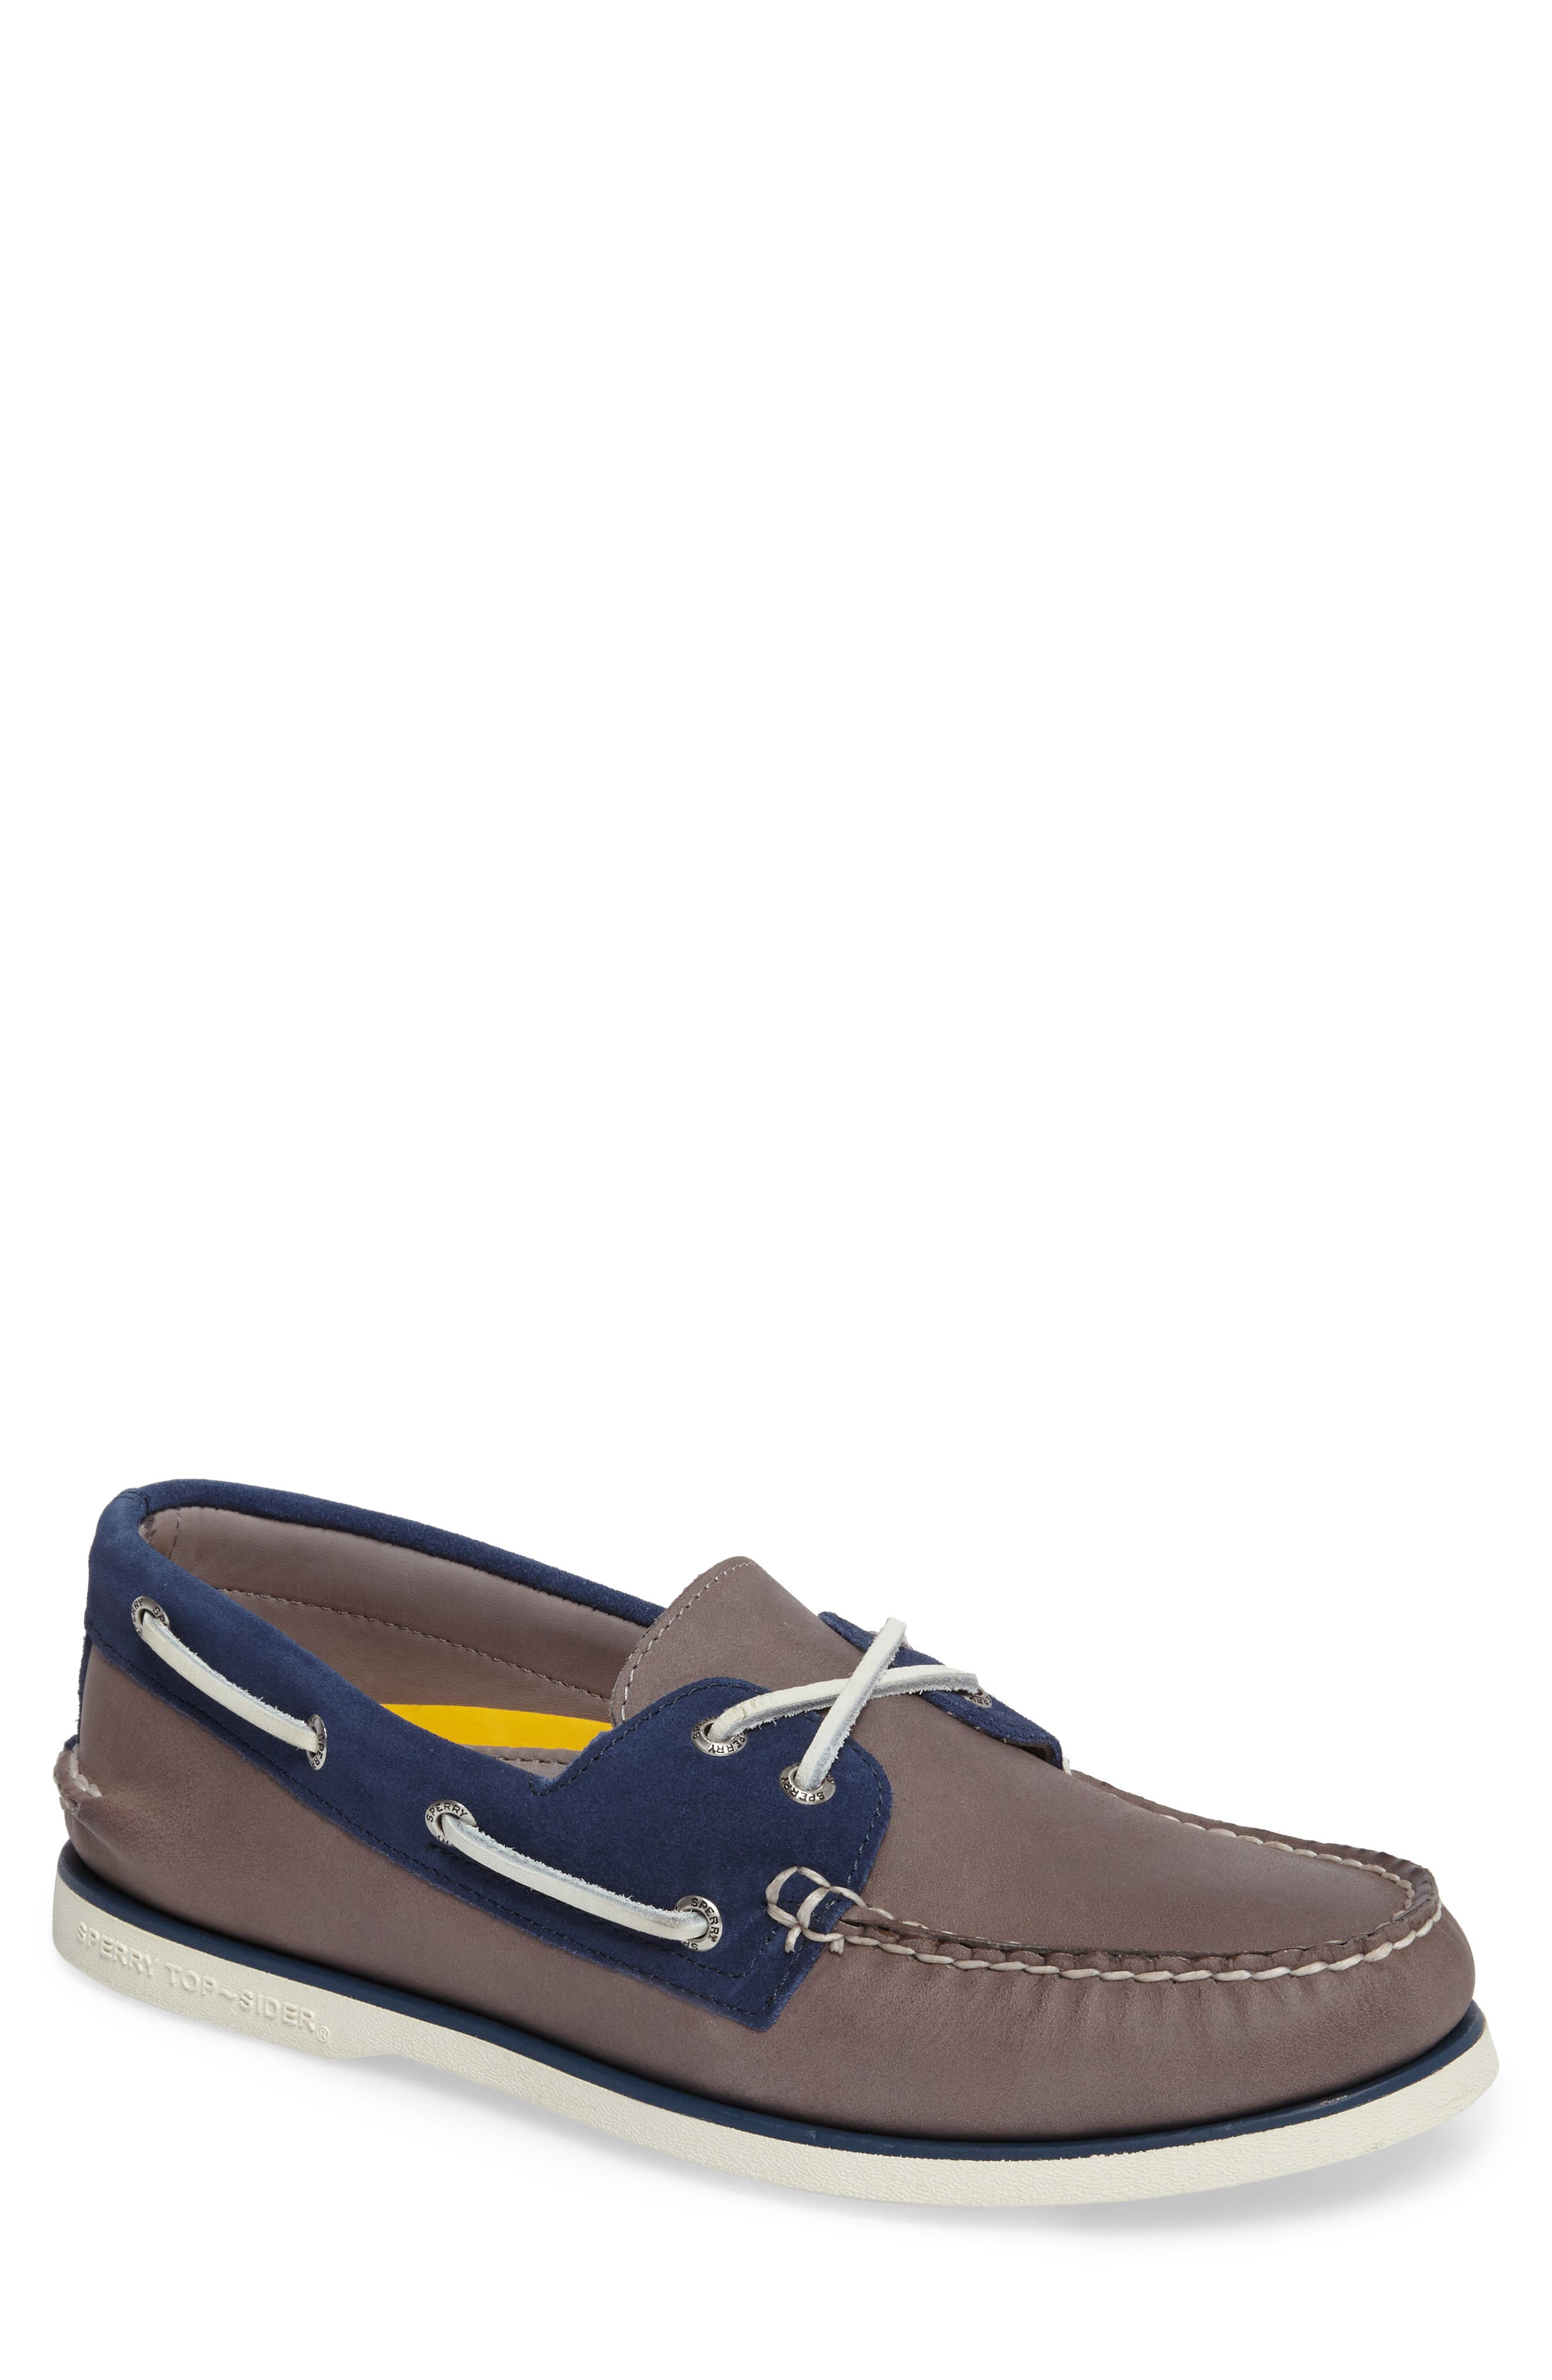 Main Image - Sperry Gold Cup Authentic Original Boat Shoe (Men)